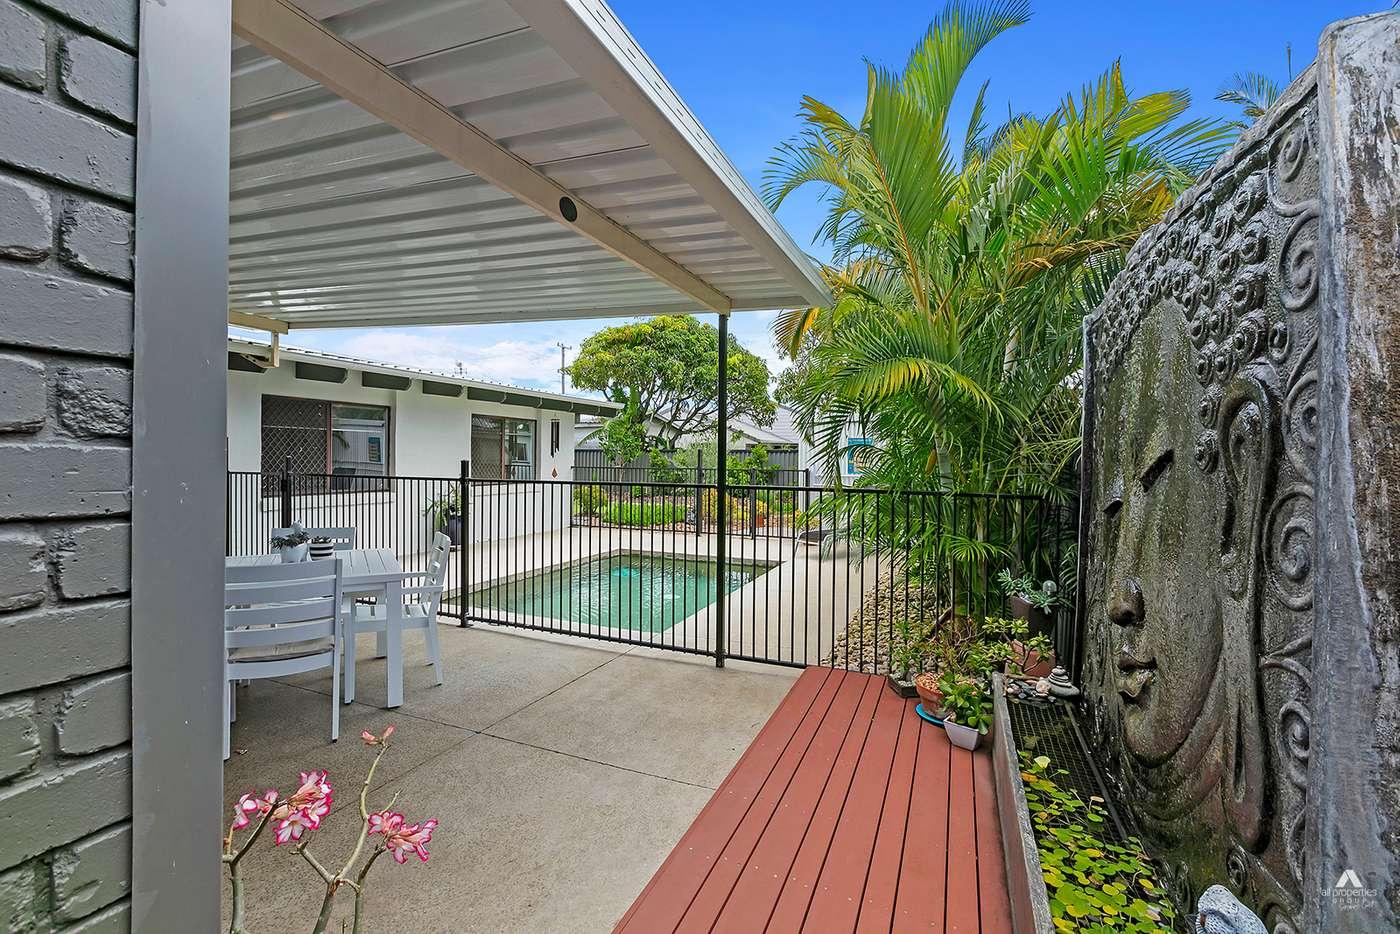 Main view of Homely house listing, 34 Parari Street, Warana QLD 4575